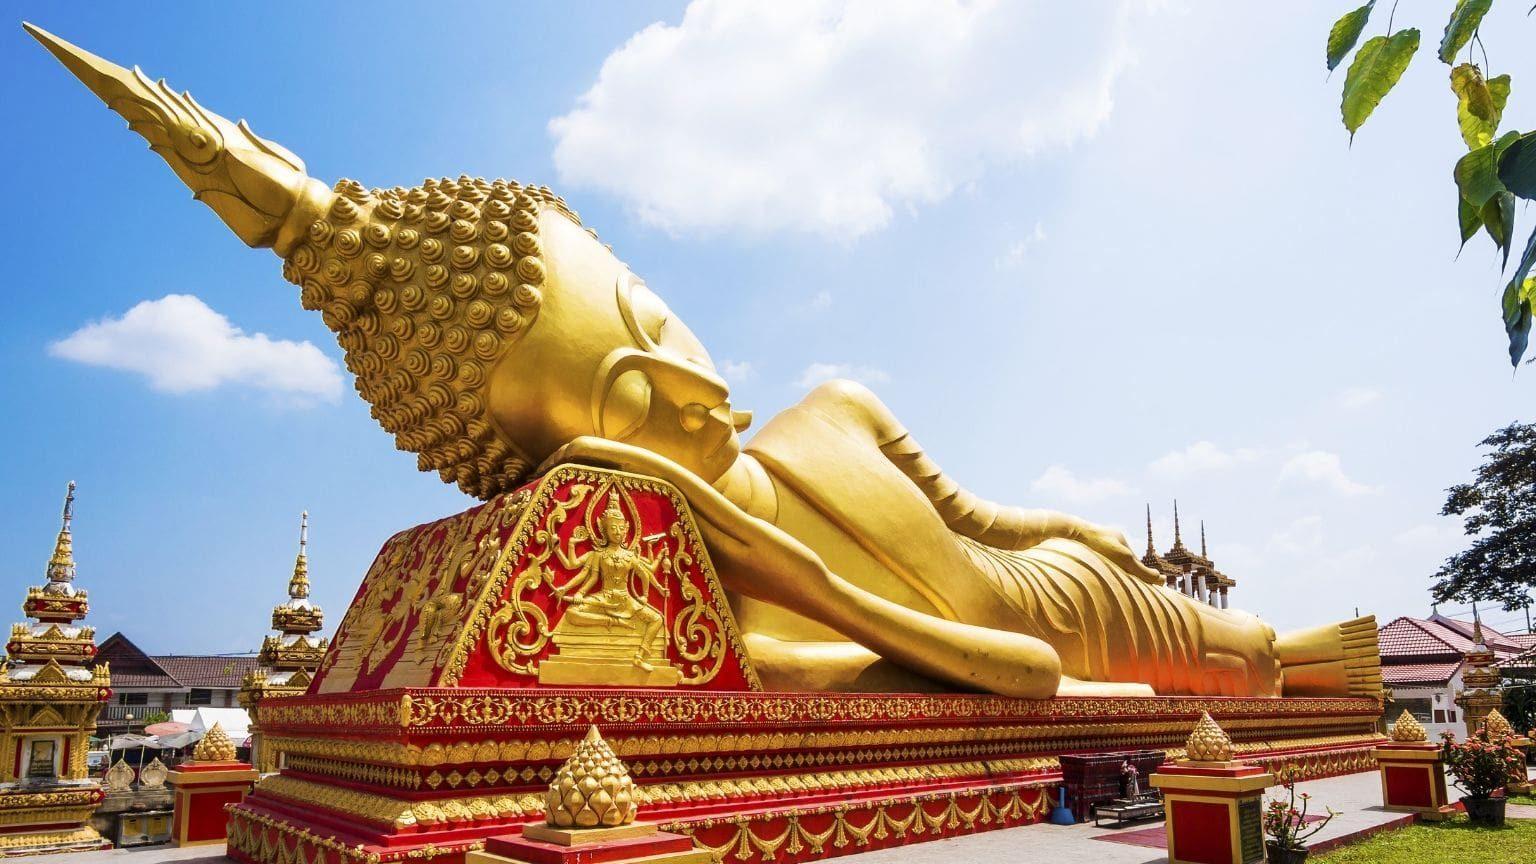 Reclining Buddha in Laos